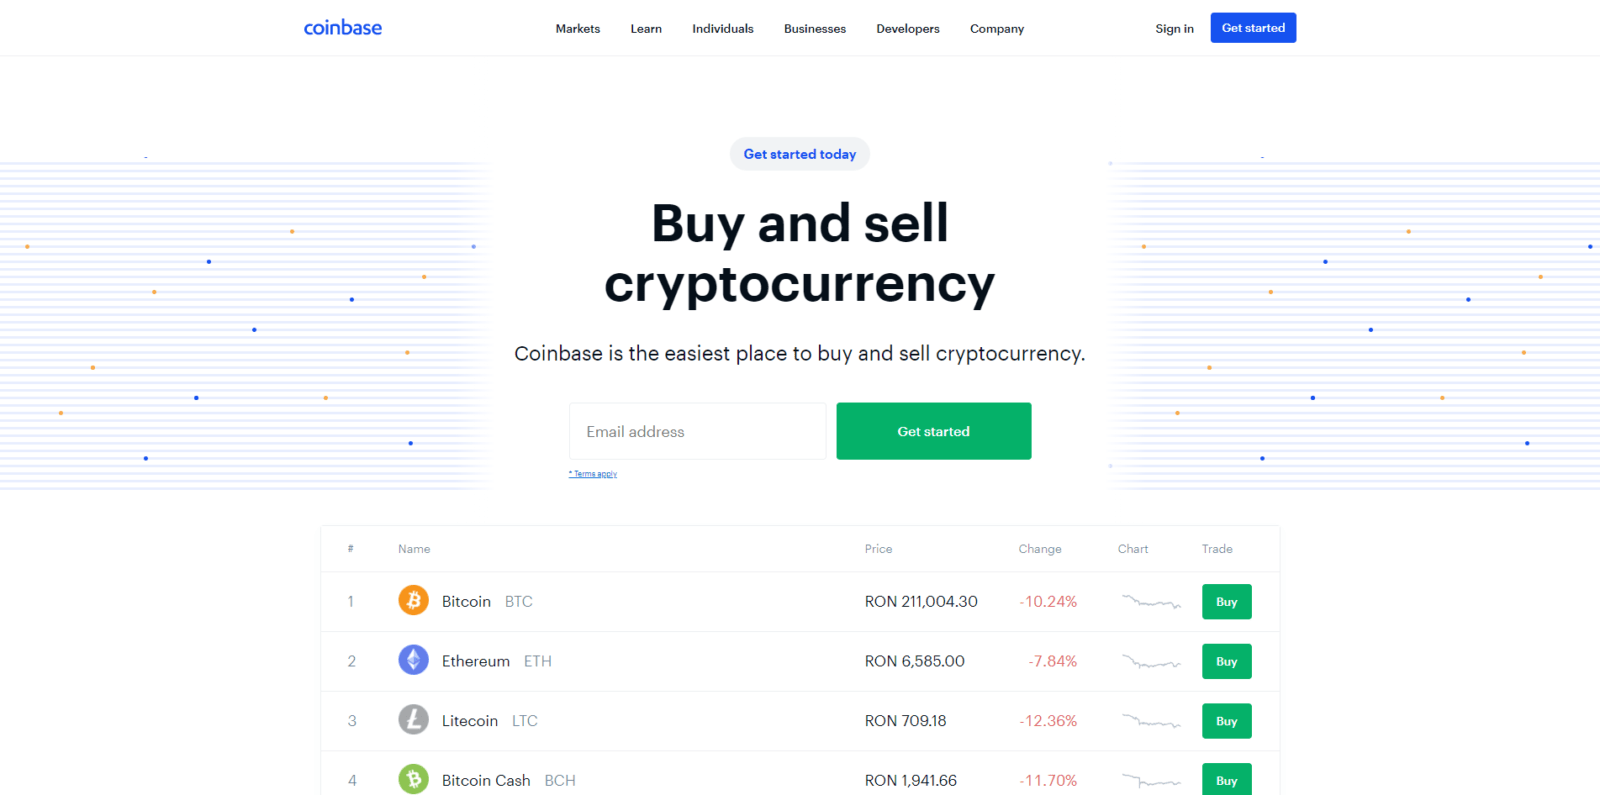 coinbase cum se depună bitcoin bitcoin momentul de tranzacționare